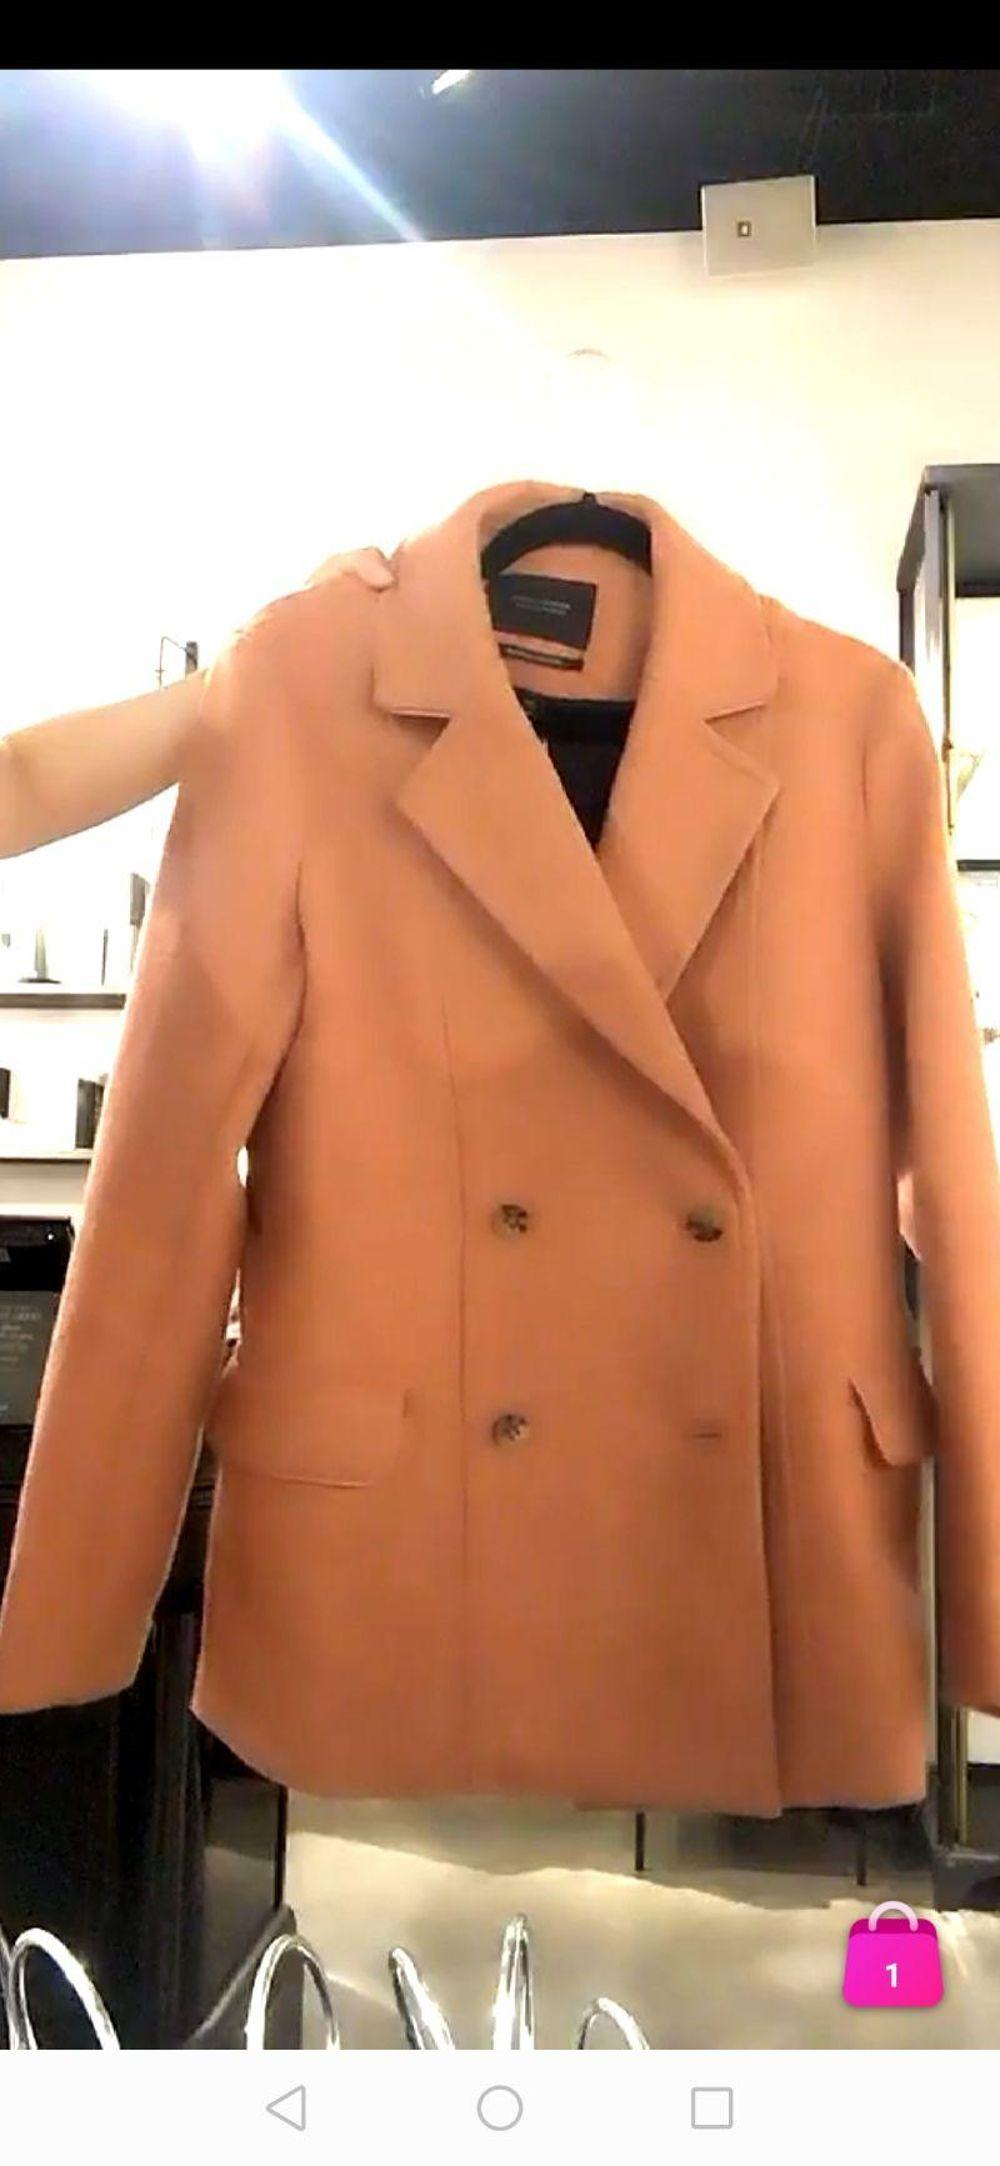 Scotch&Soda羊毛混纺橘色双排扣大衣(直播商品不退不换)